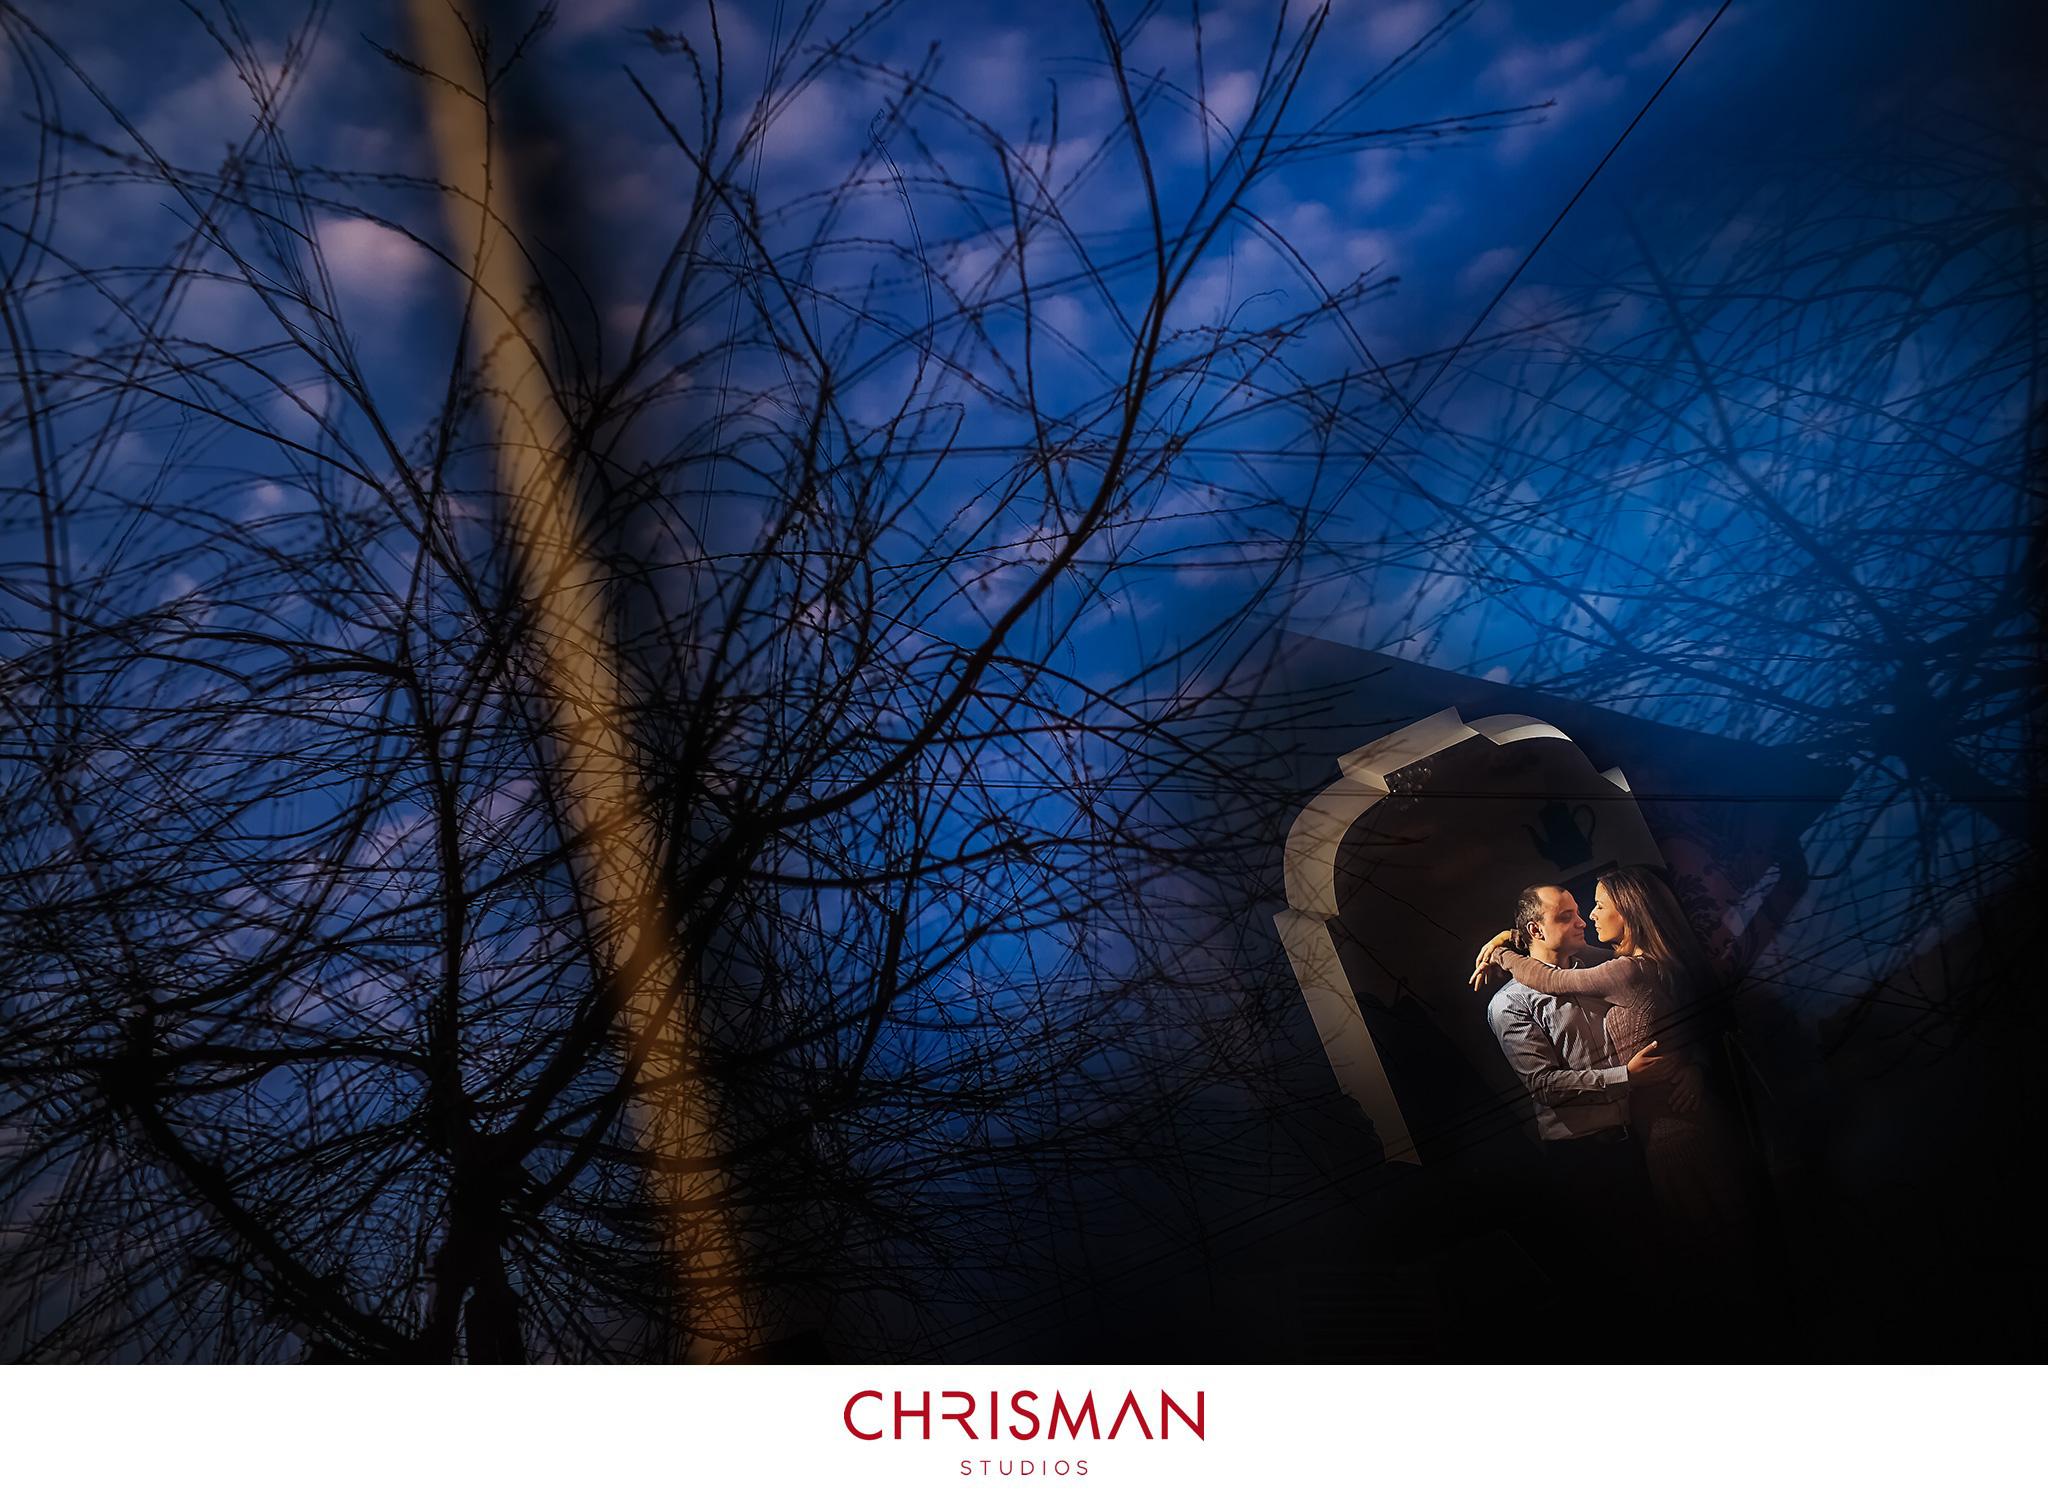 chrisman studios 03